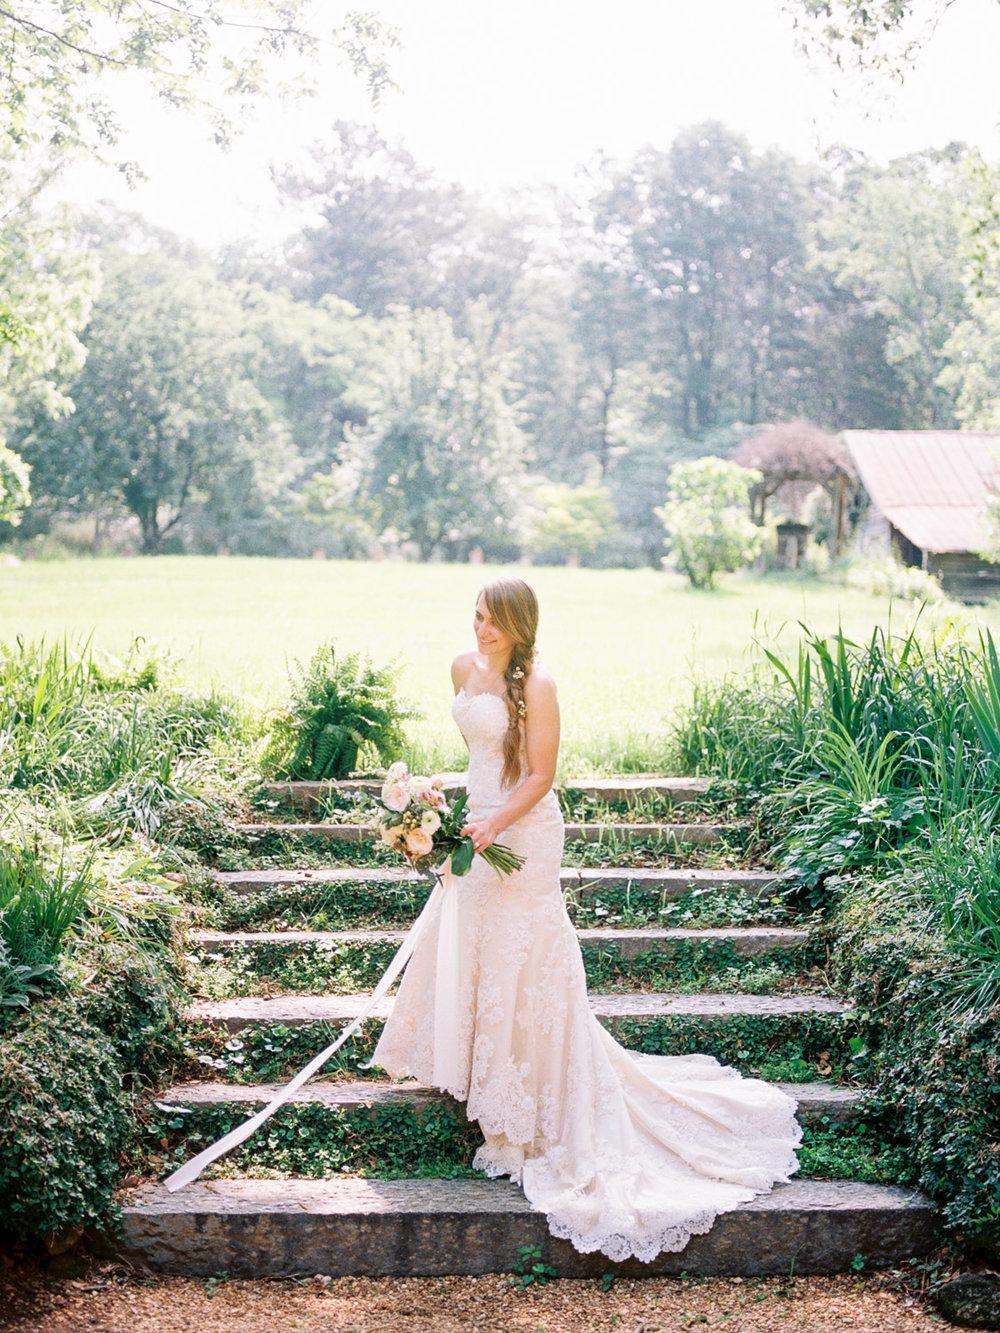 christinadavisphotography-romanticwedding-gardenweddinginspiration16.jpg